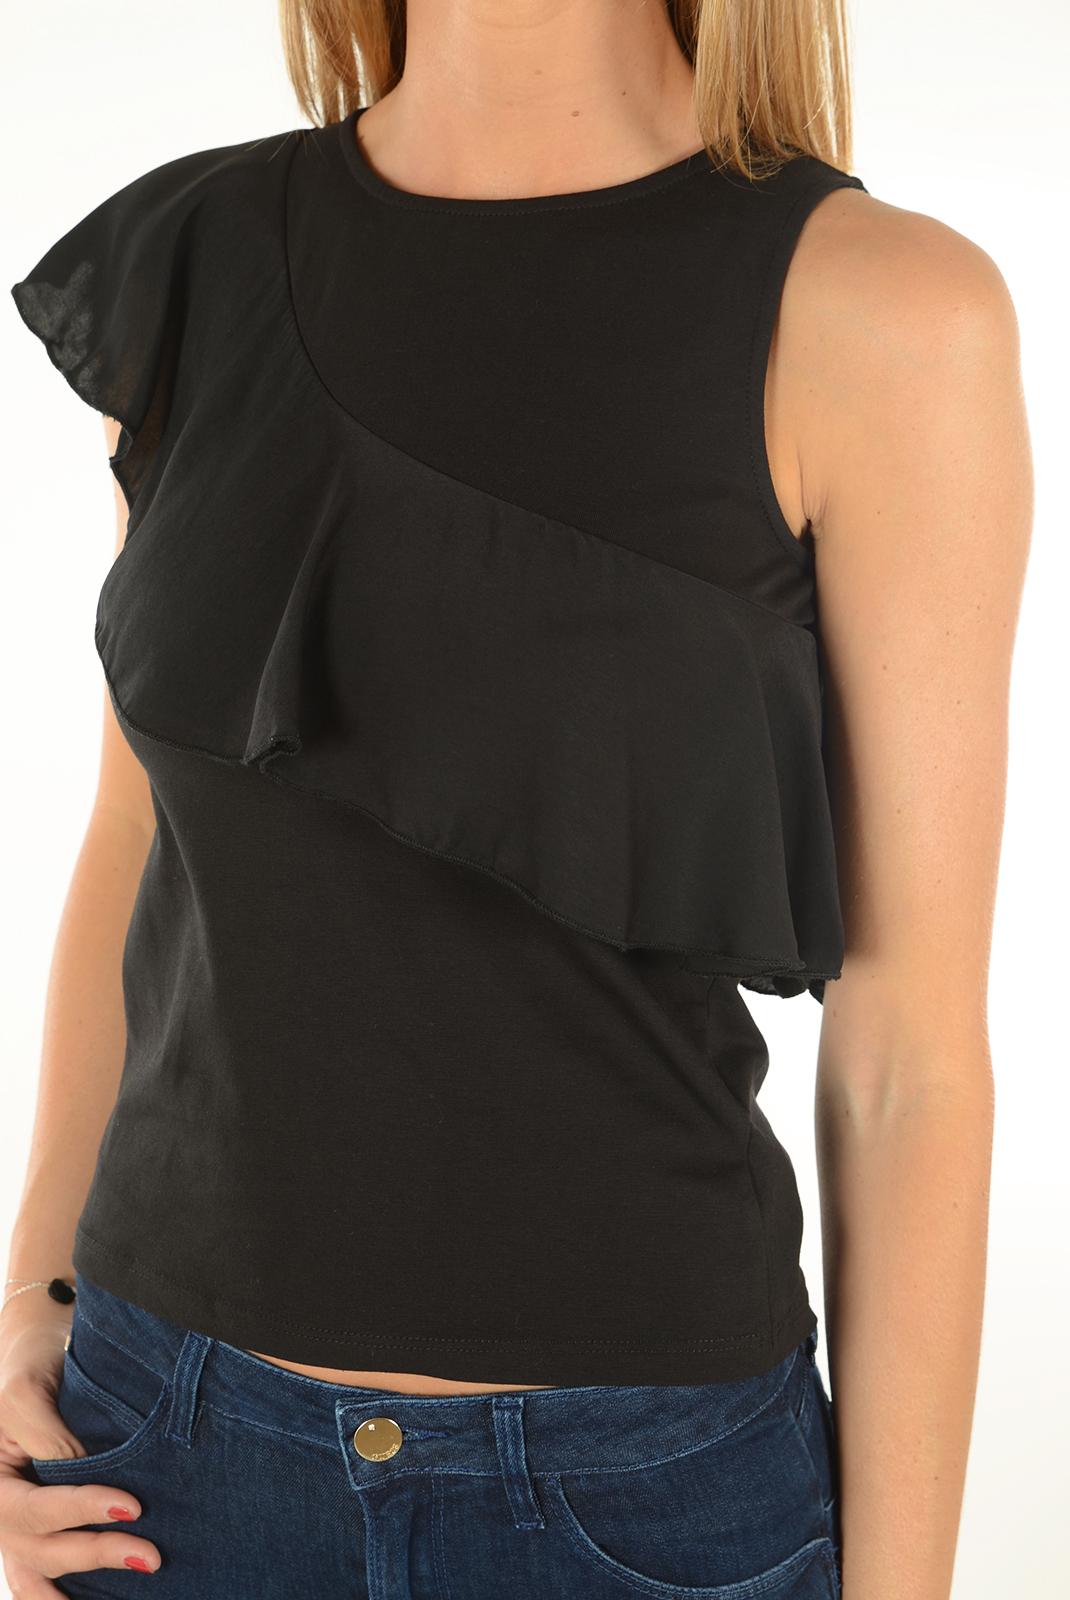 Tops & Tee shirts  Only BINA S/L FRILL TOP BLACK